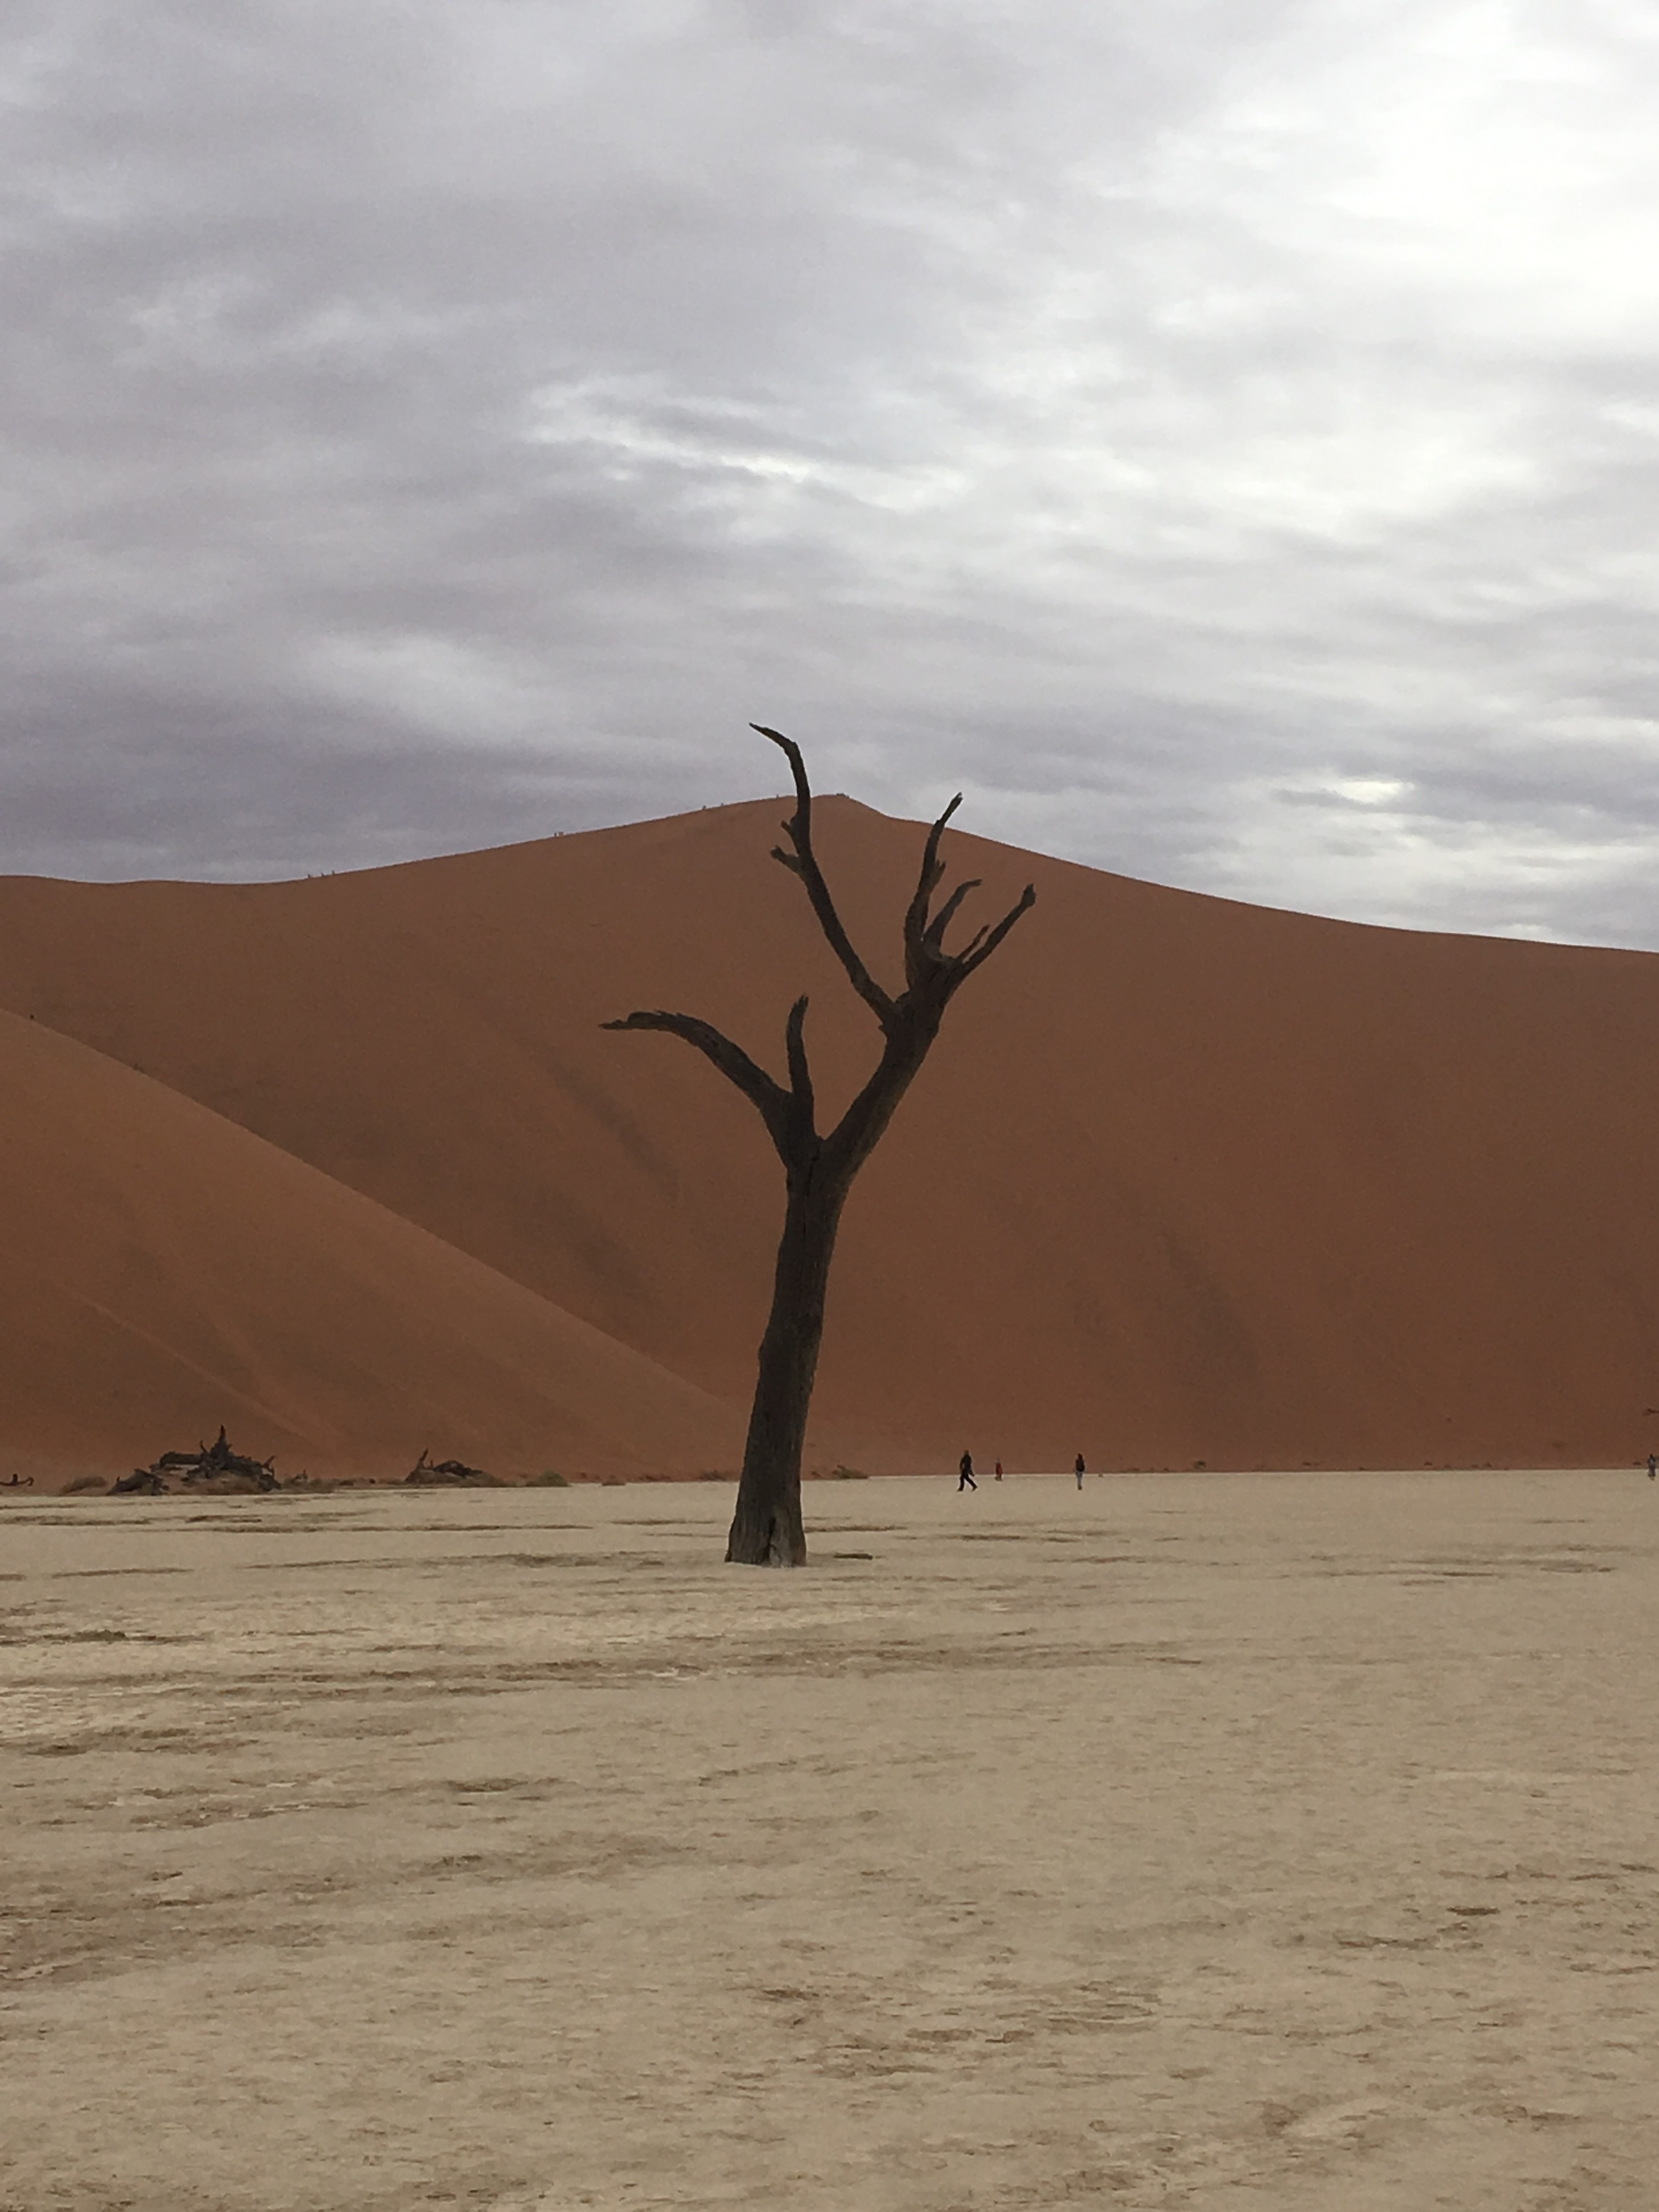 Namibia - Dawid Augustyn - SquareSpace